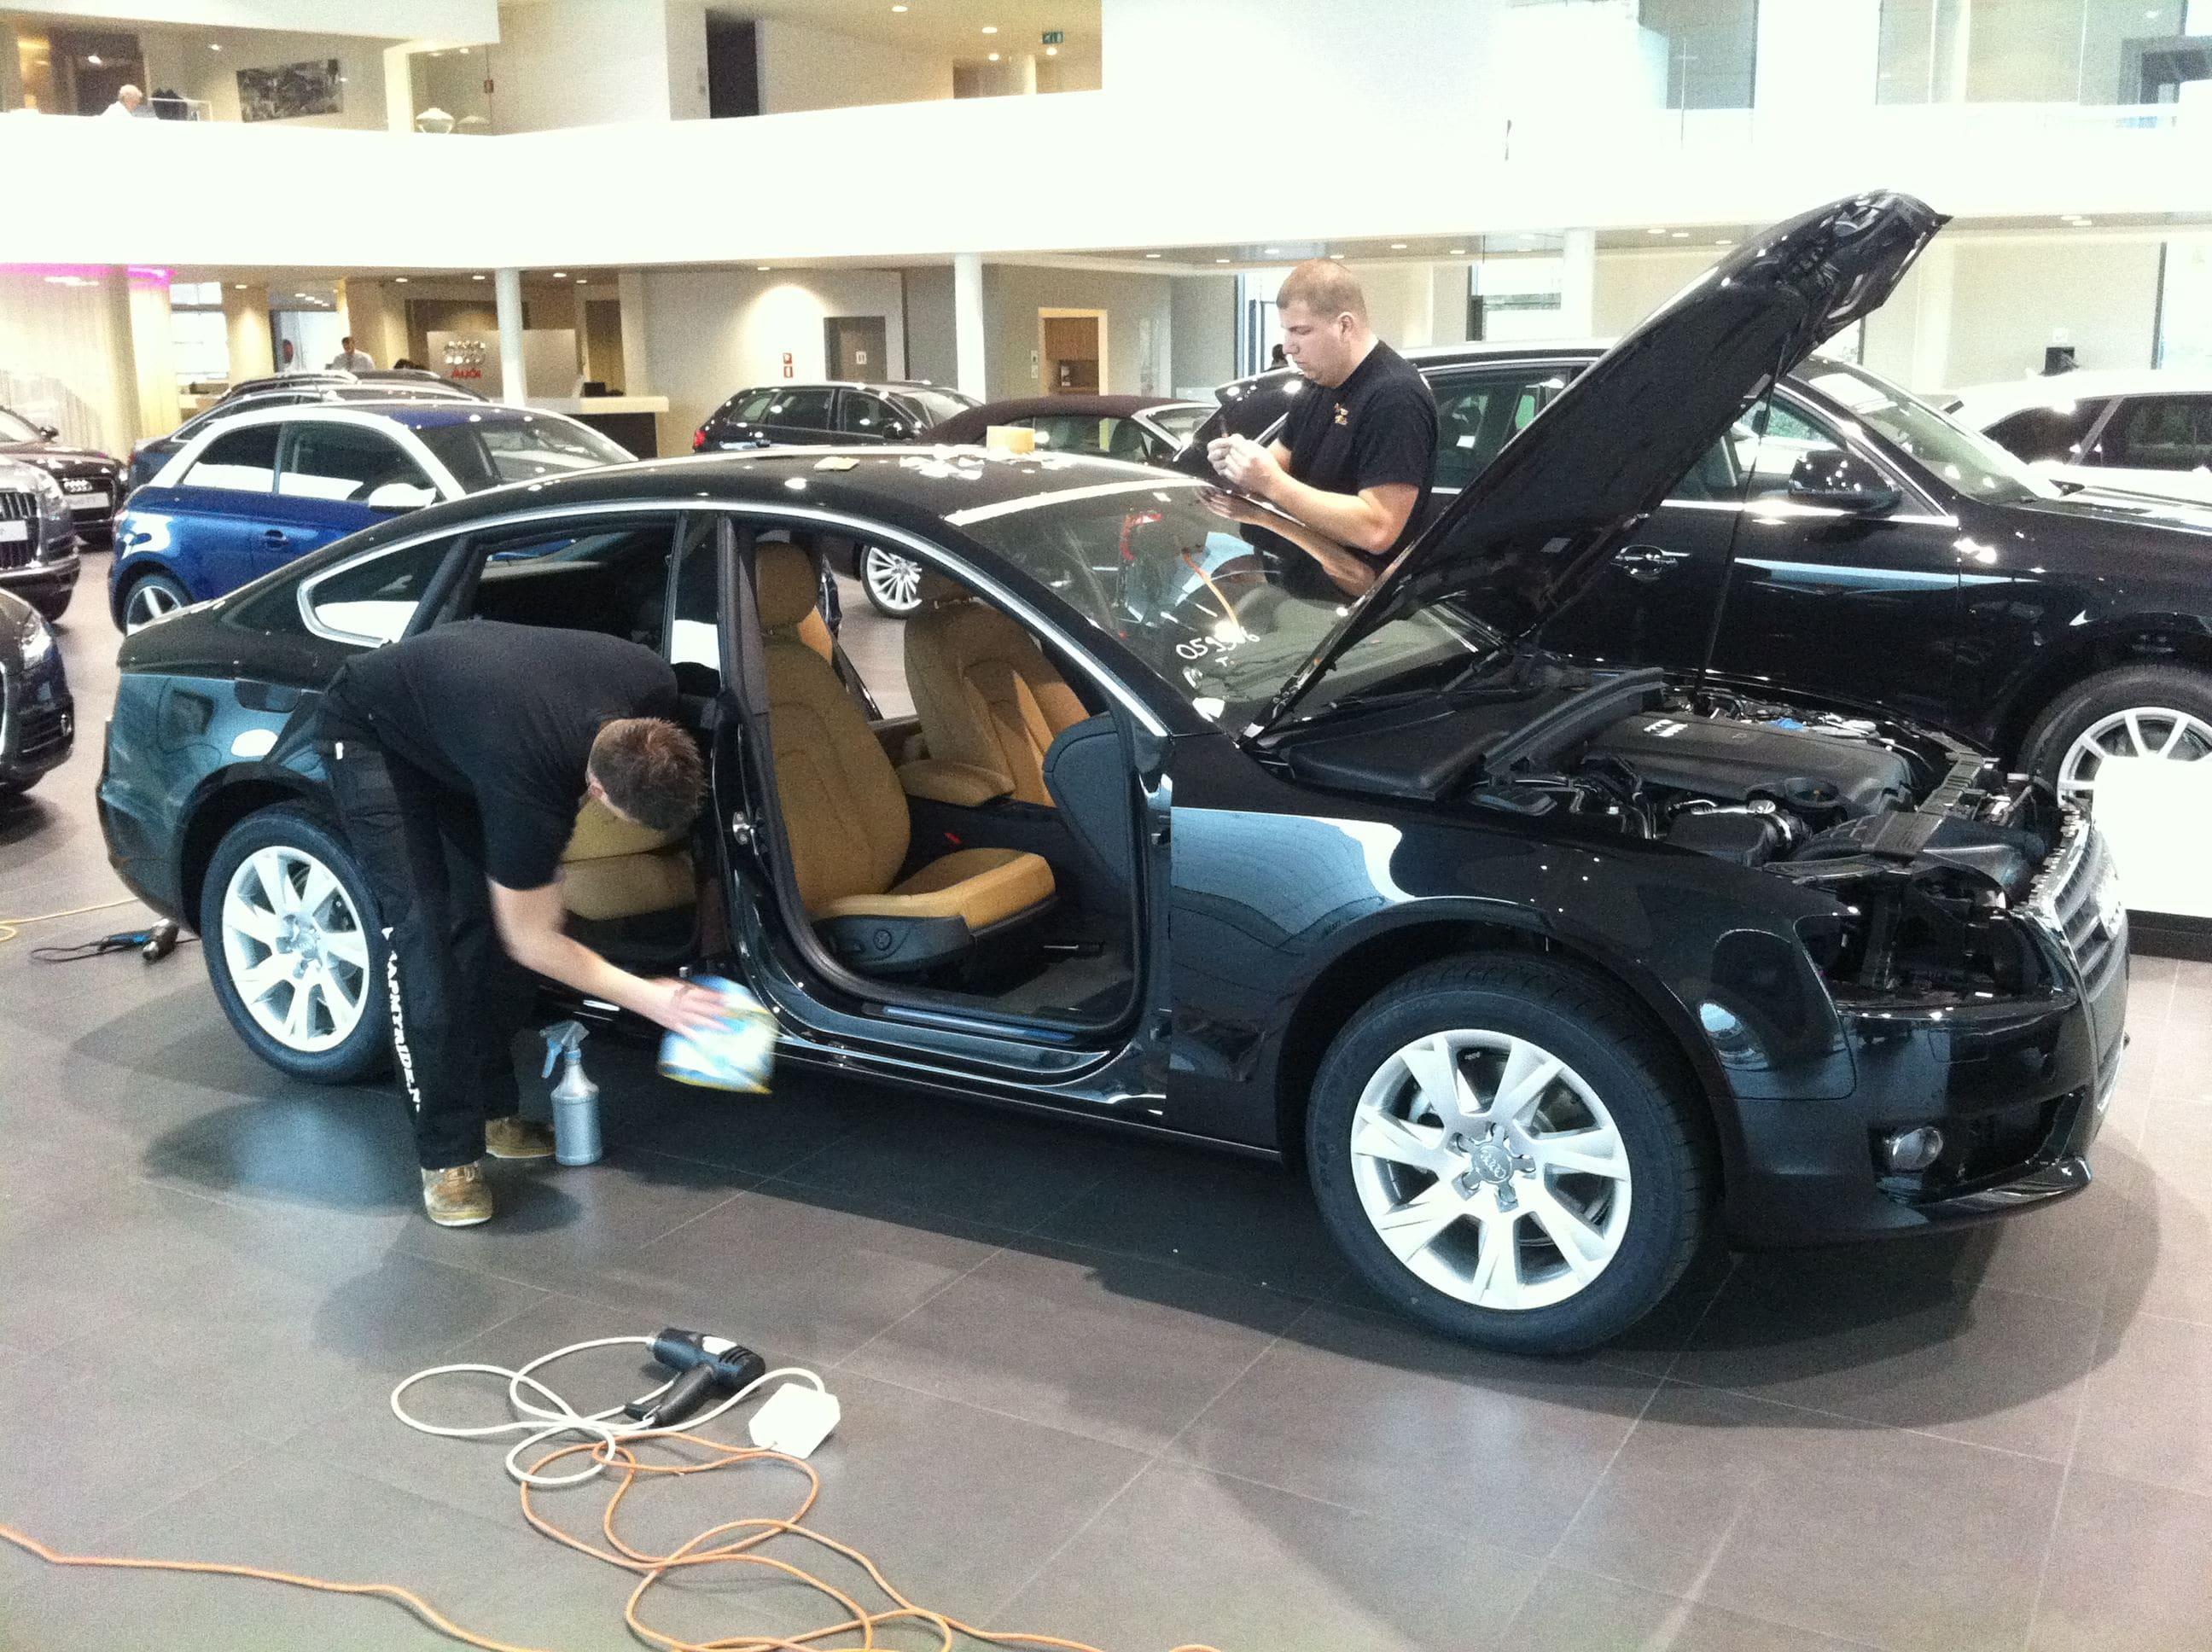 Audi A5 Sportback met Mat Grijze Wrap, Carwrapping door Wrapmyride.nu Foto-nr:4756, ©2021